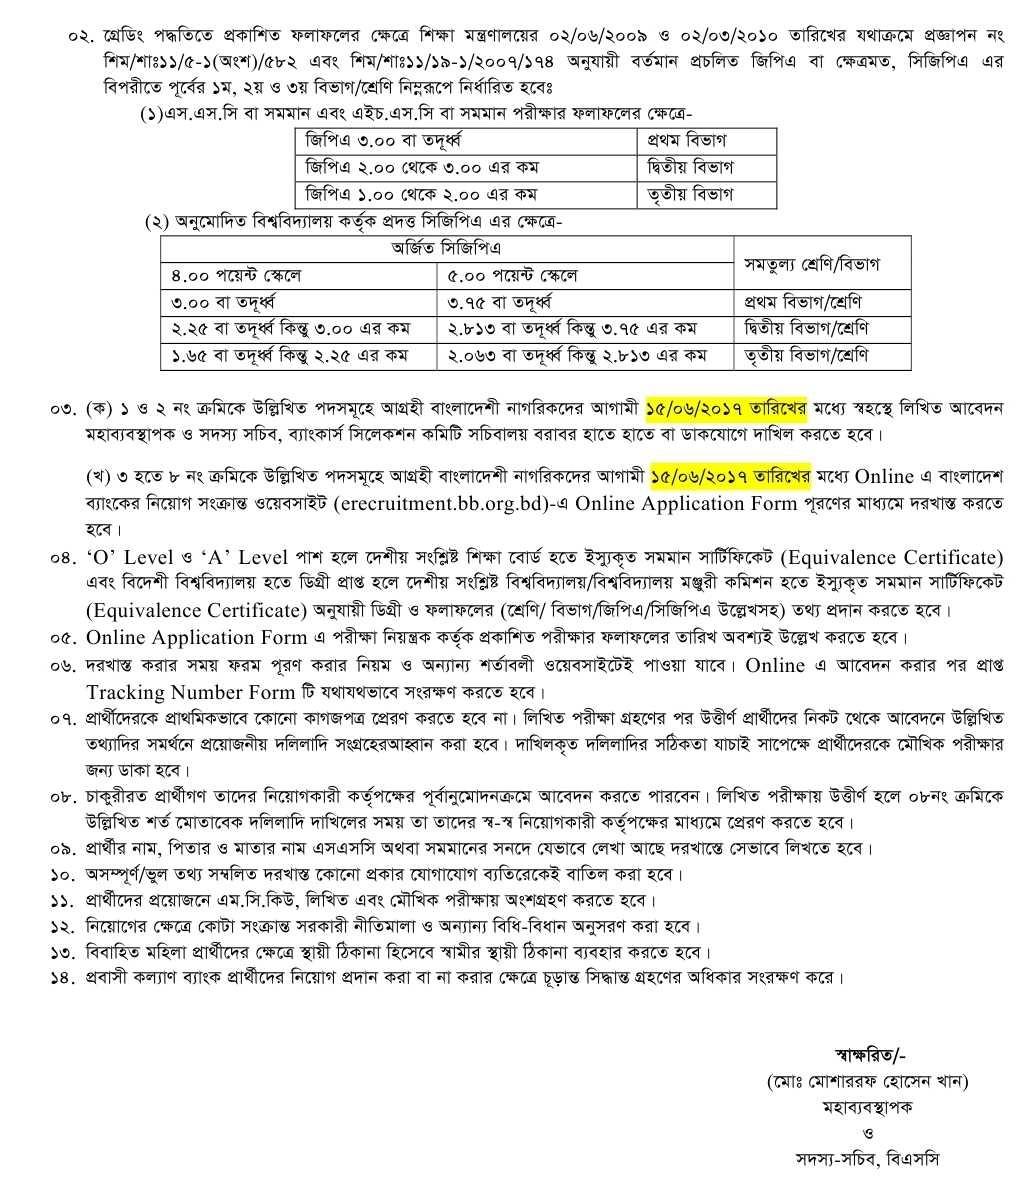 Probashi Kallyan Bank Job Circular 2017